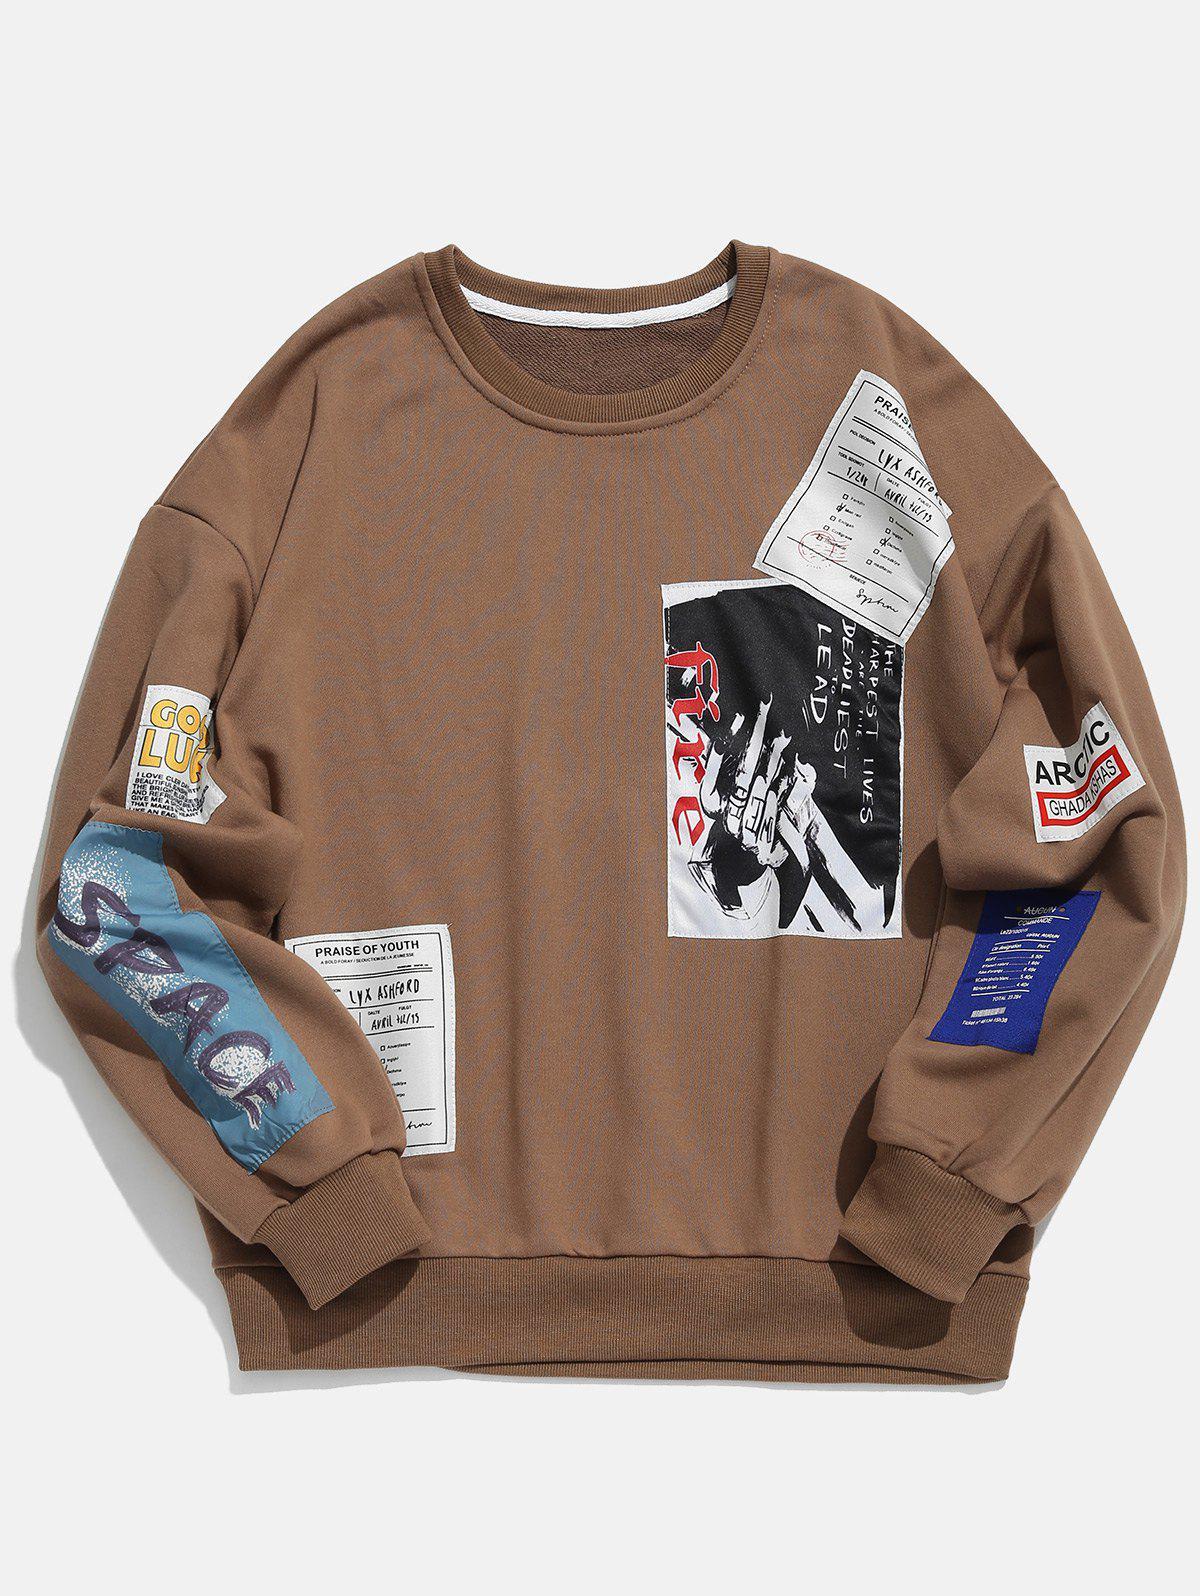 Crew Neck Applique Embellished Pullover Sweatshirt